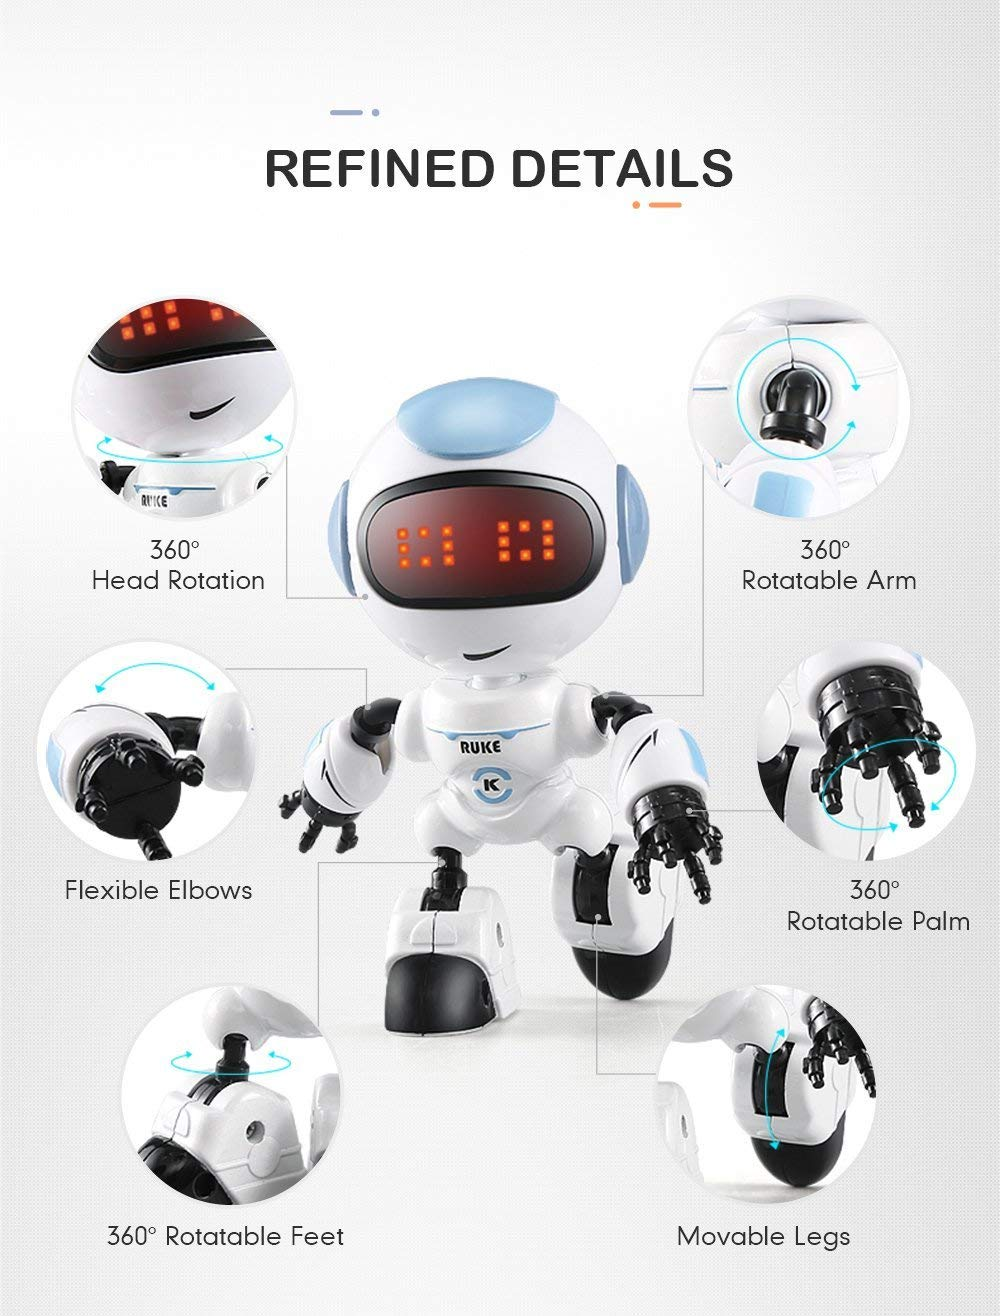 JJRC R8 LUKE Intelligent Robot Touch Control DIY Gesture Talk Smart Mini RC Robot Gift Toy 9